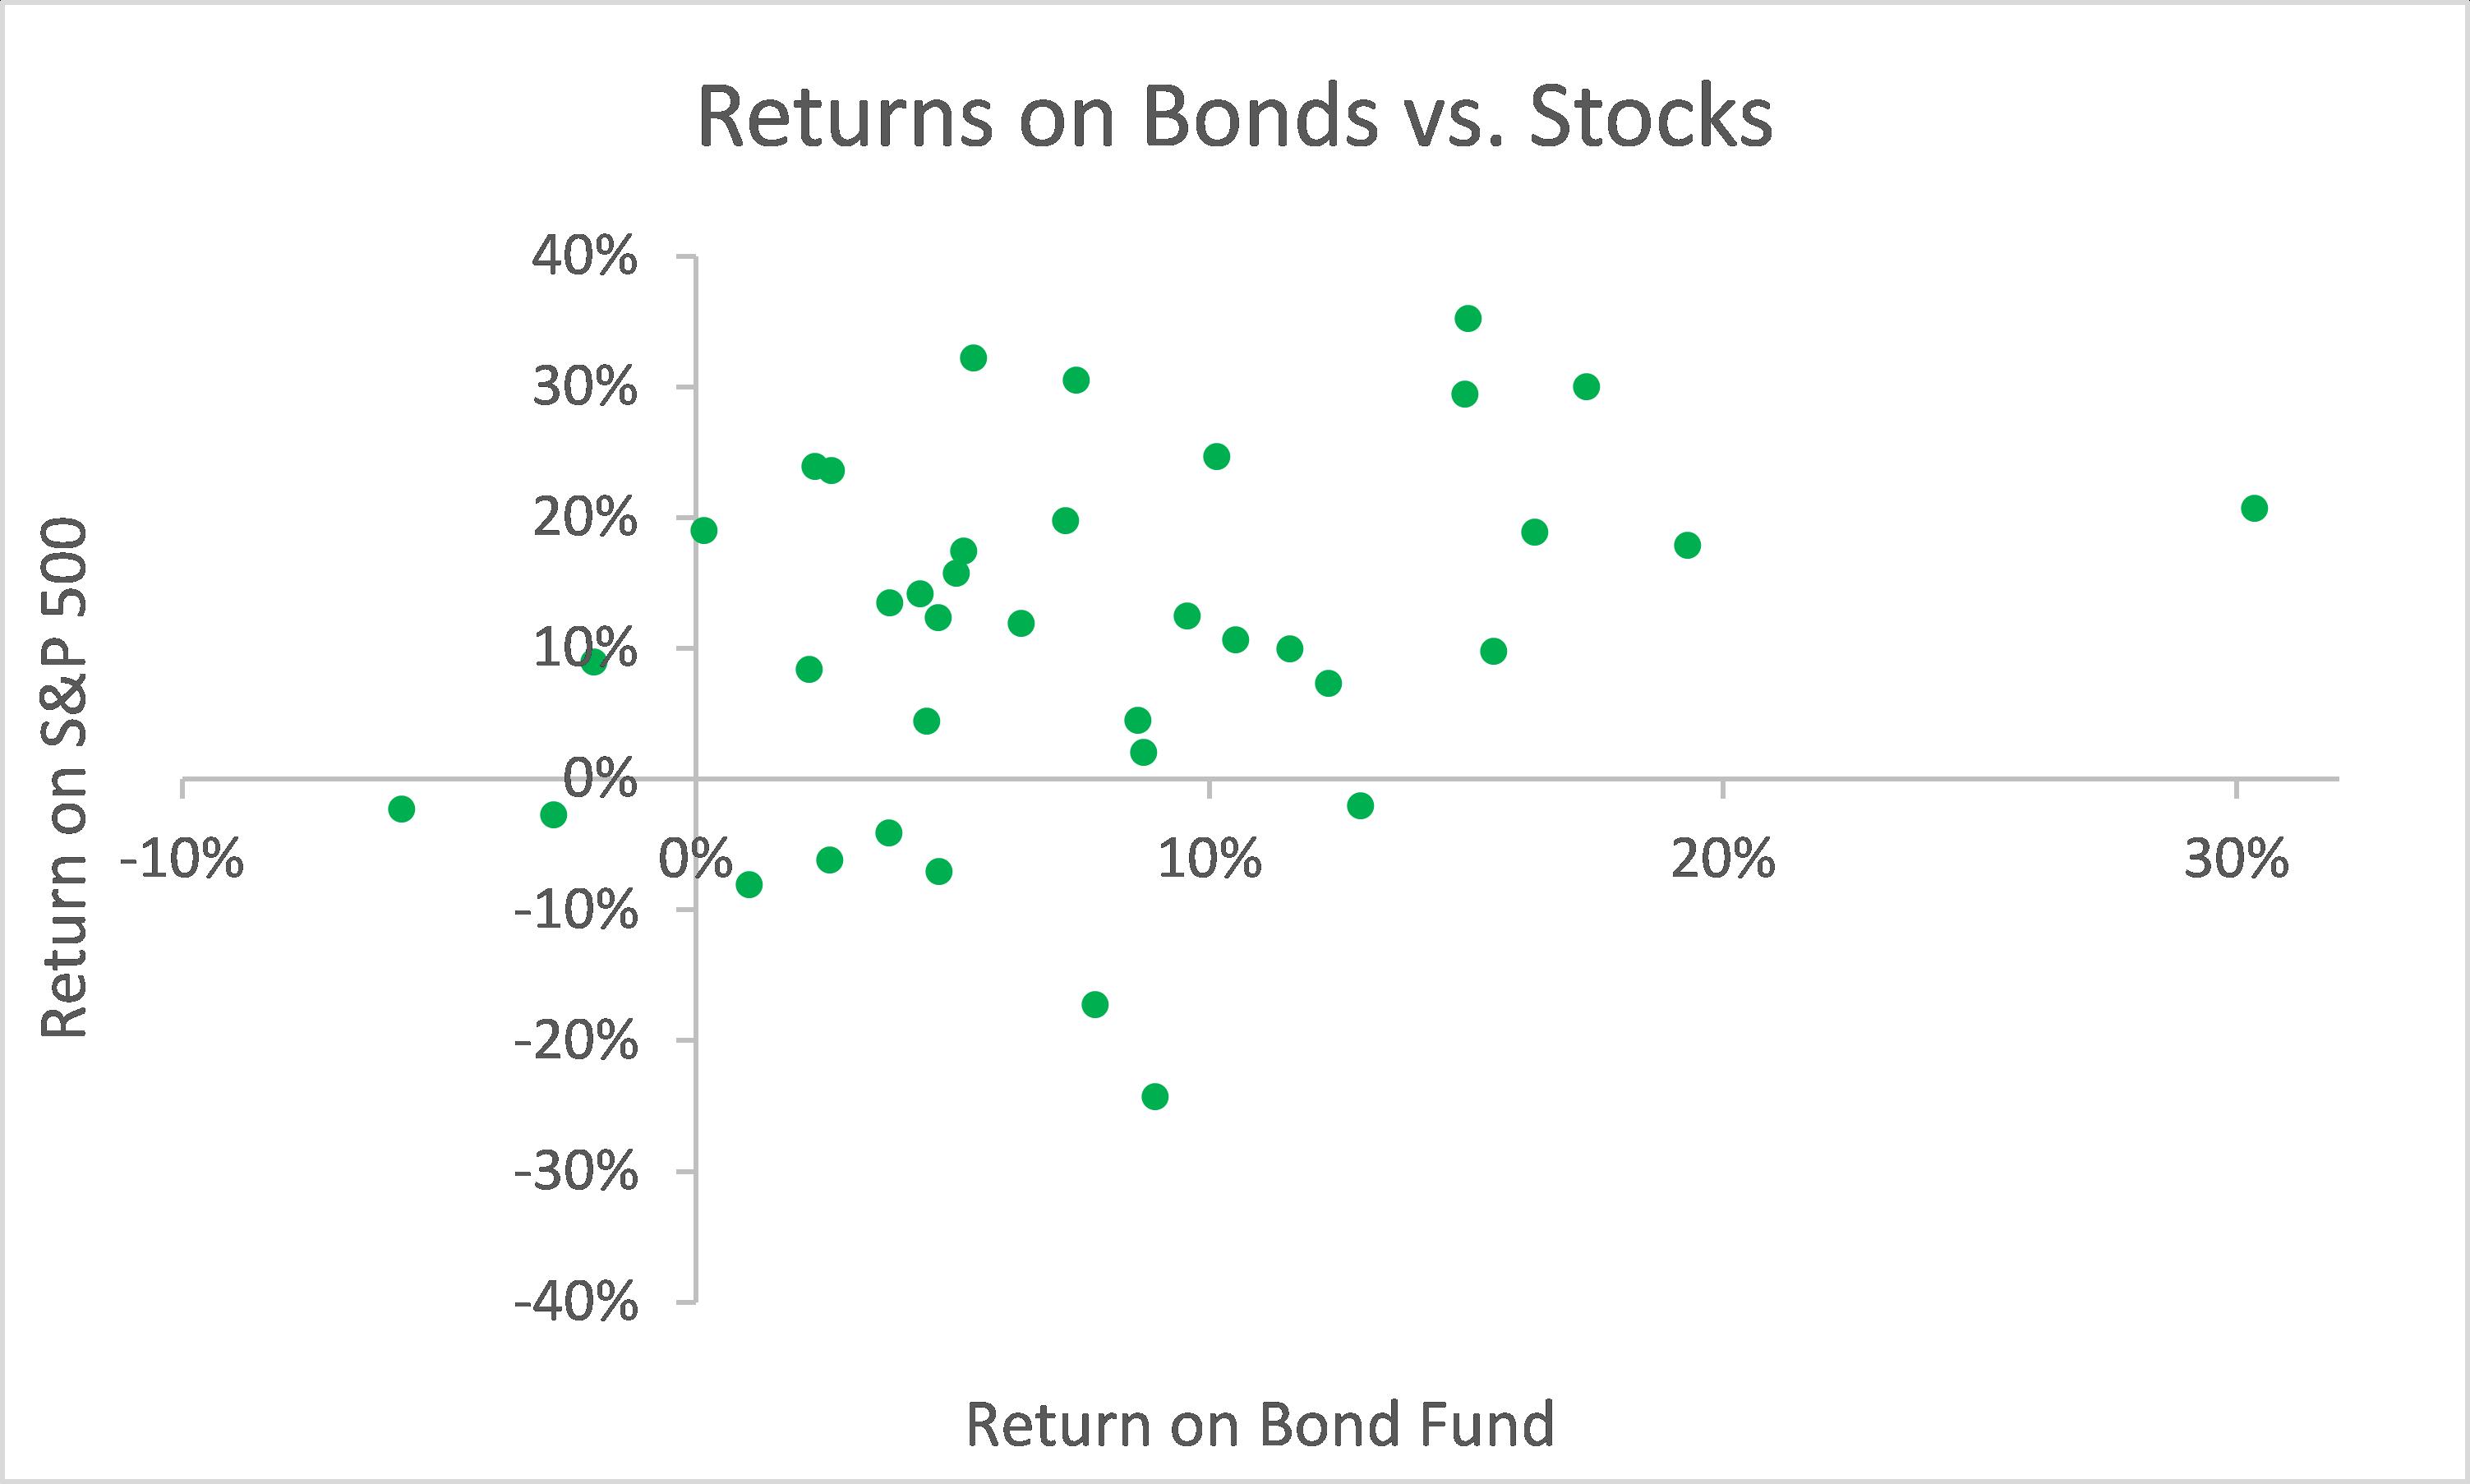 10 Year Treasury vs. S&P 500 Scatter Plot